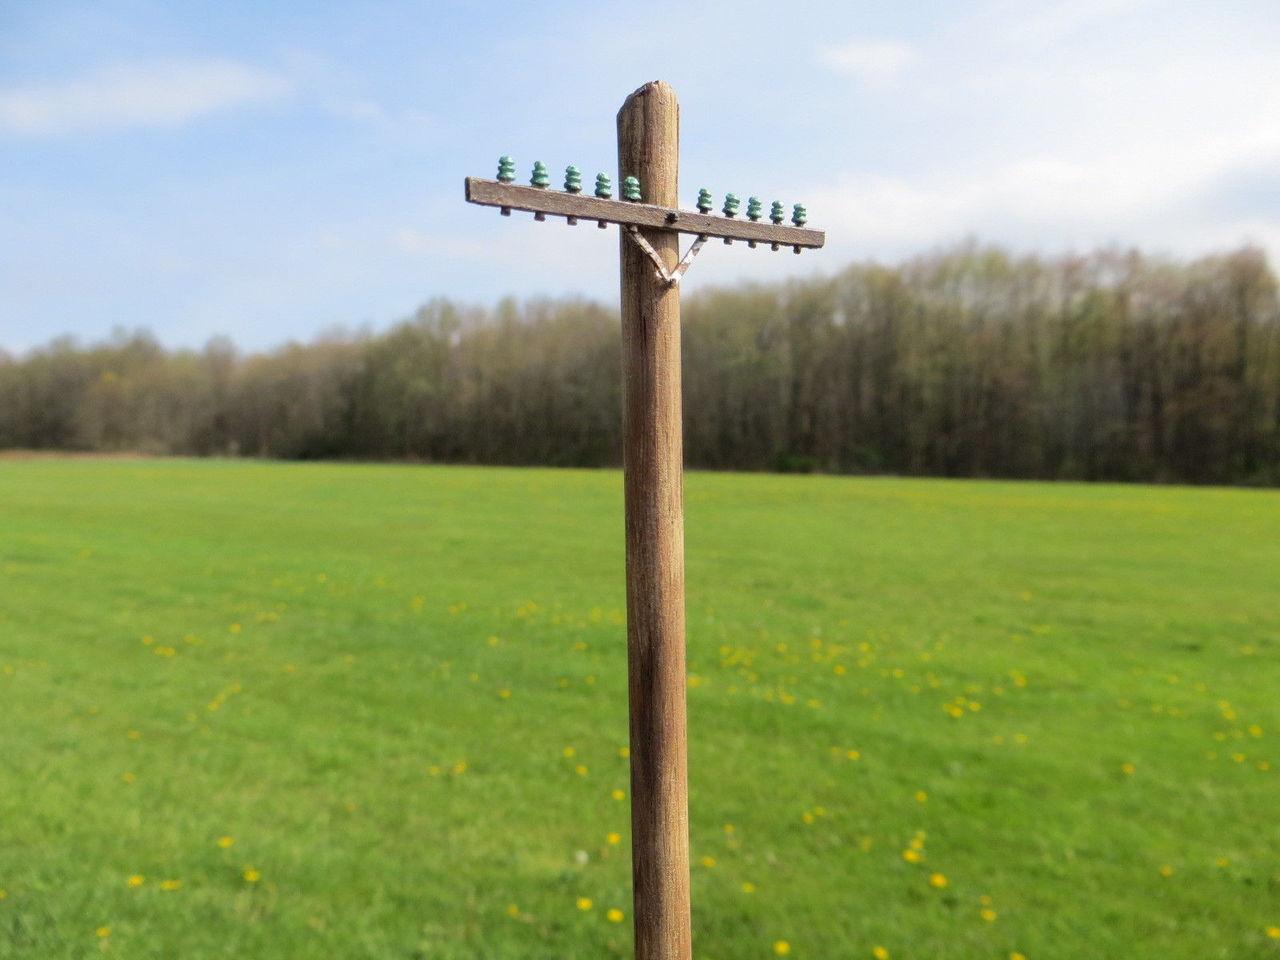 48-1181 Utility Pole Single Crossarm Basic Kit Electric Telephone O Scale QTY 6 FKA KEIL LINE